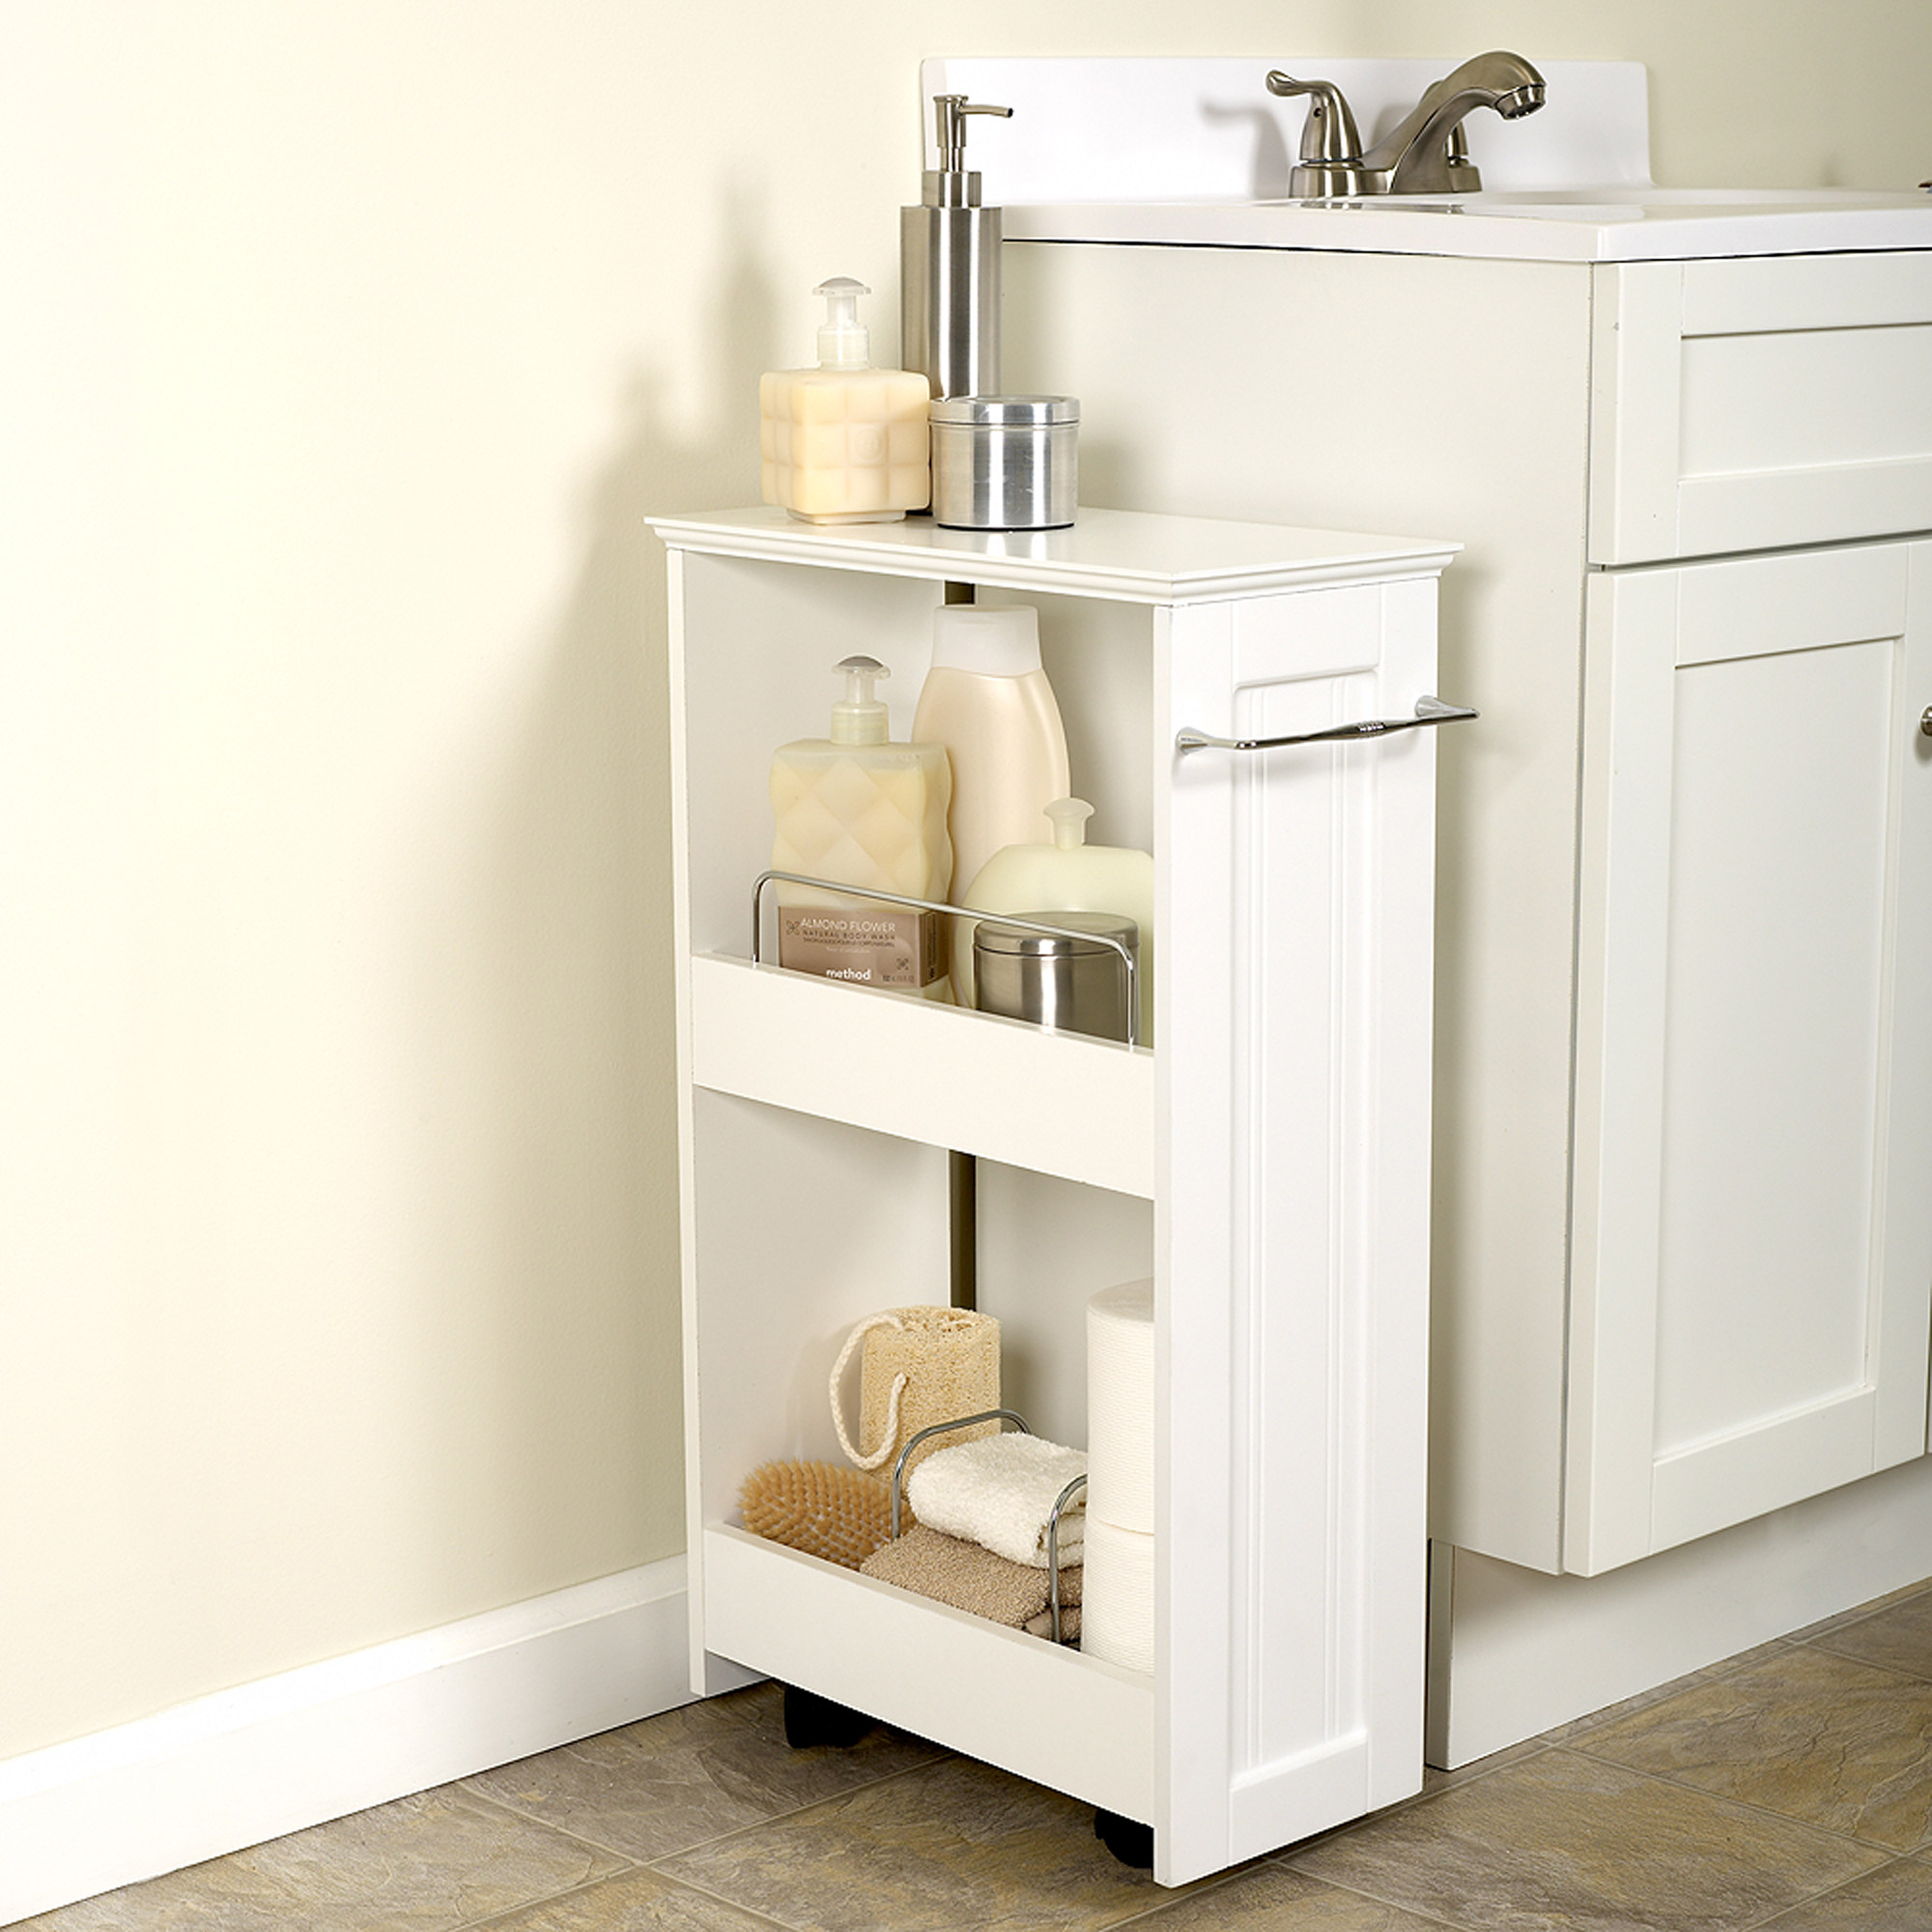 Bathroom Sink Dreamy Person Elegant Bathroom Pedestal Sink Storage Cabinet